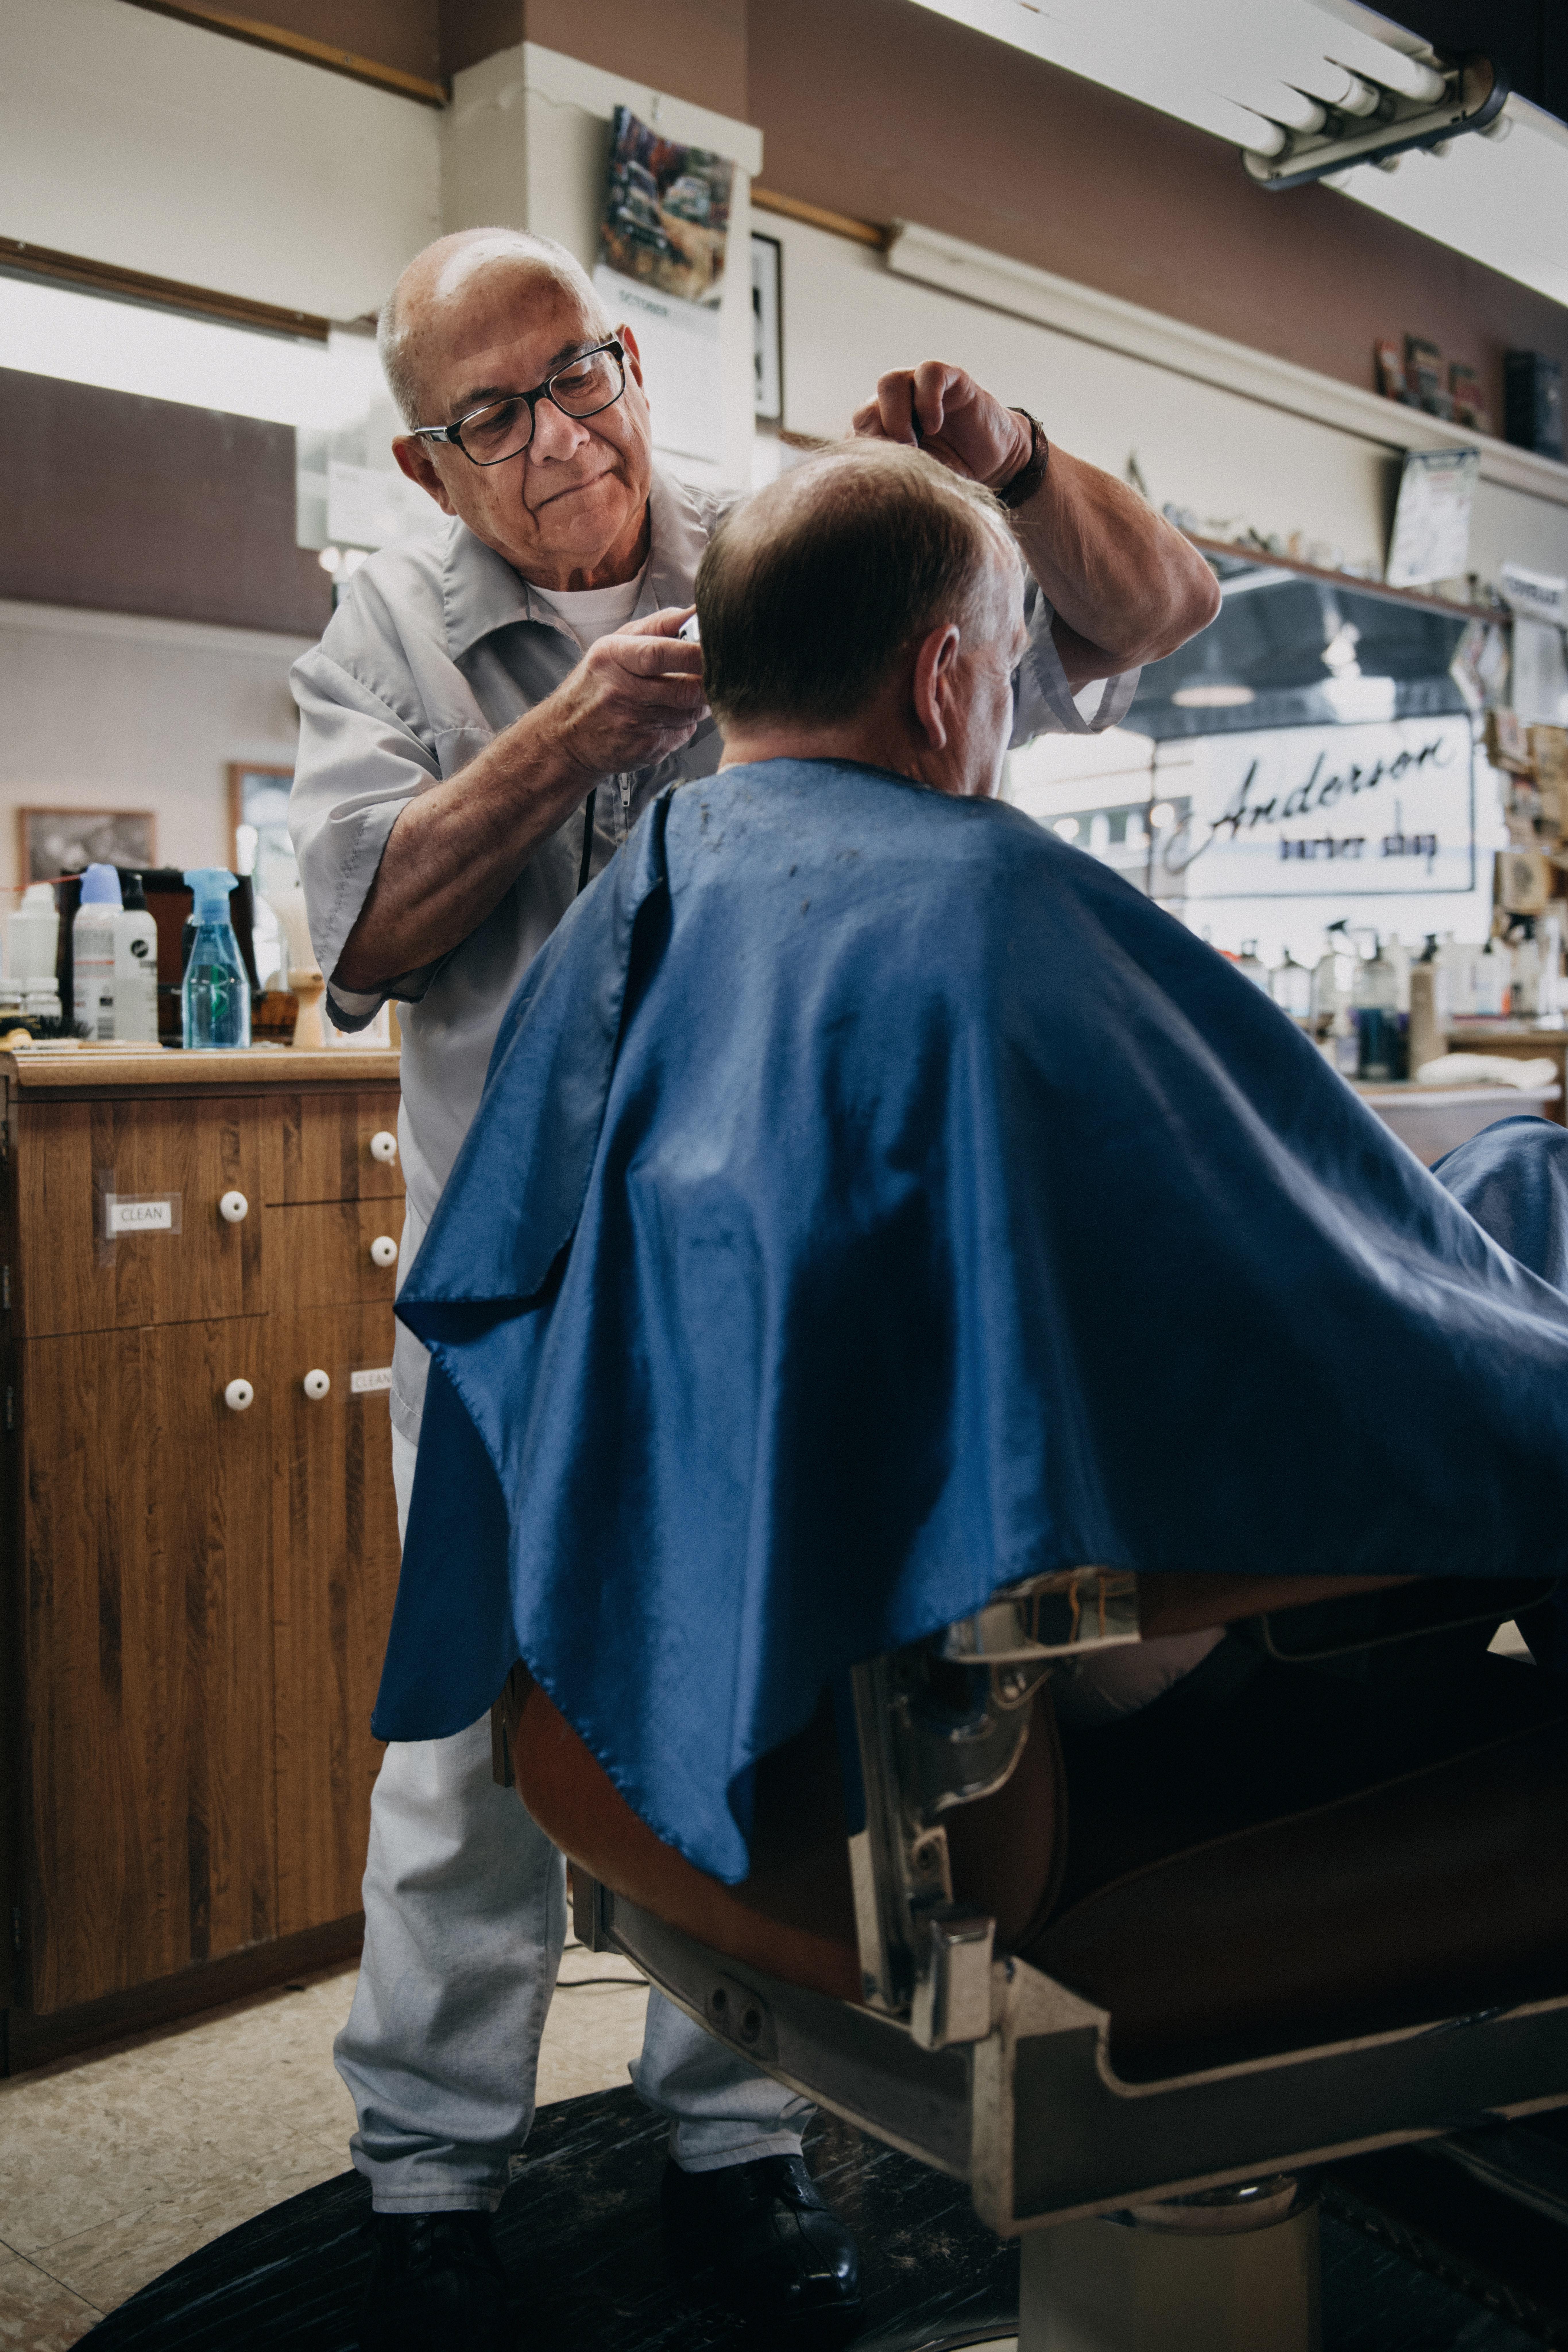 Barber Cutting Man's Hair · Free Stock Photo